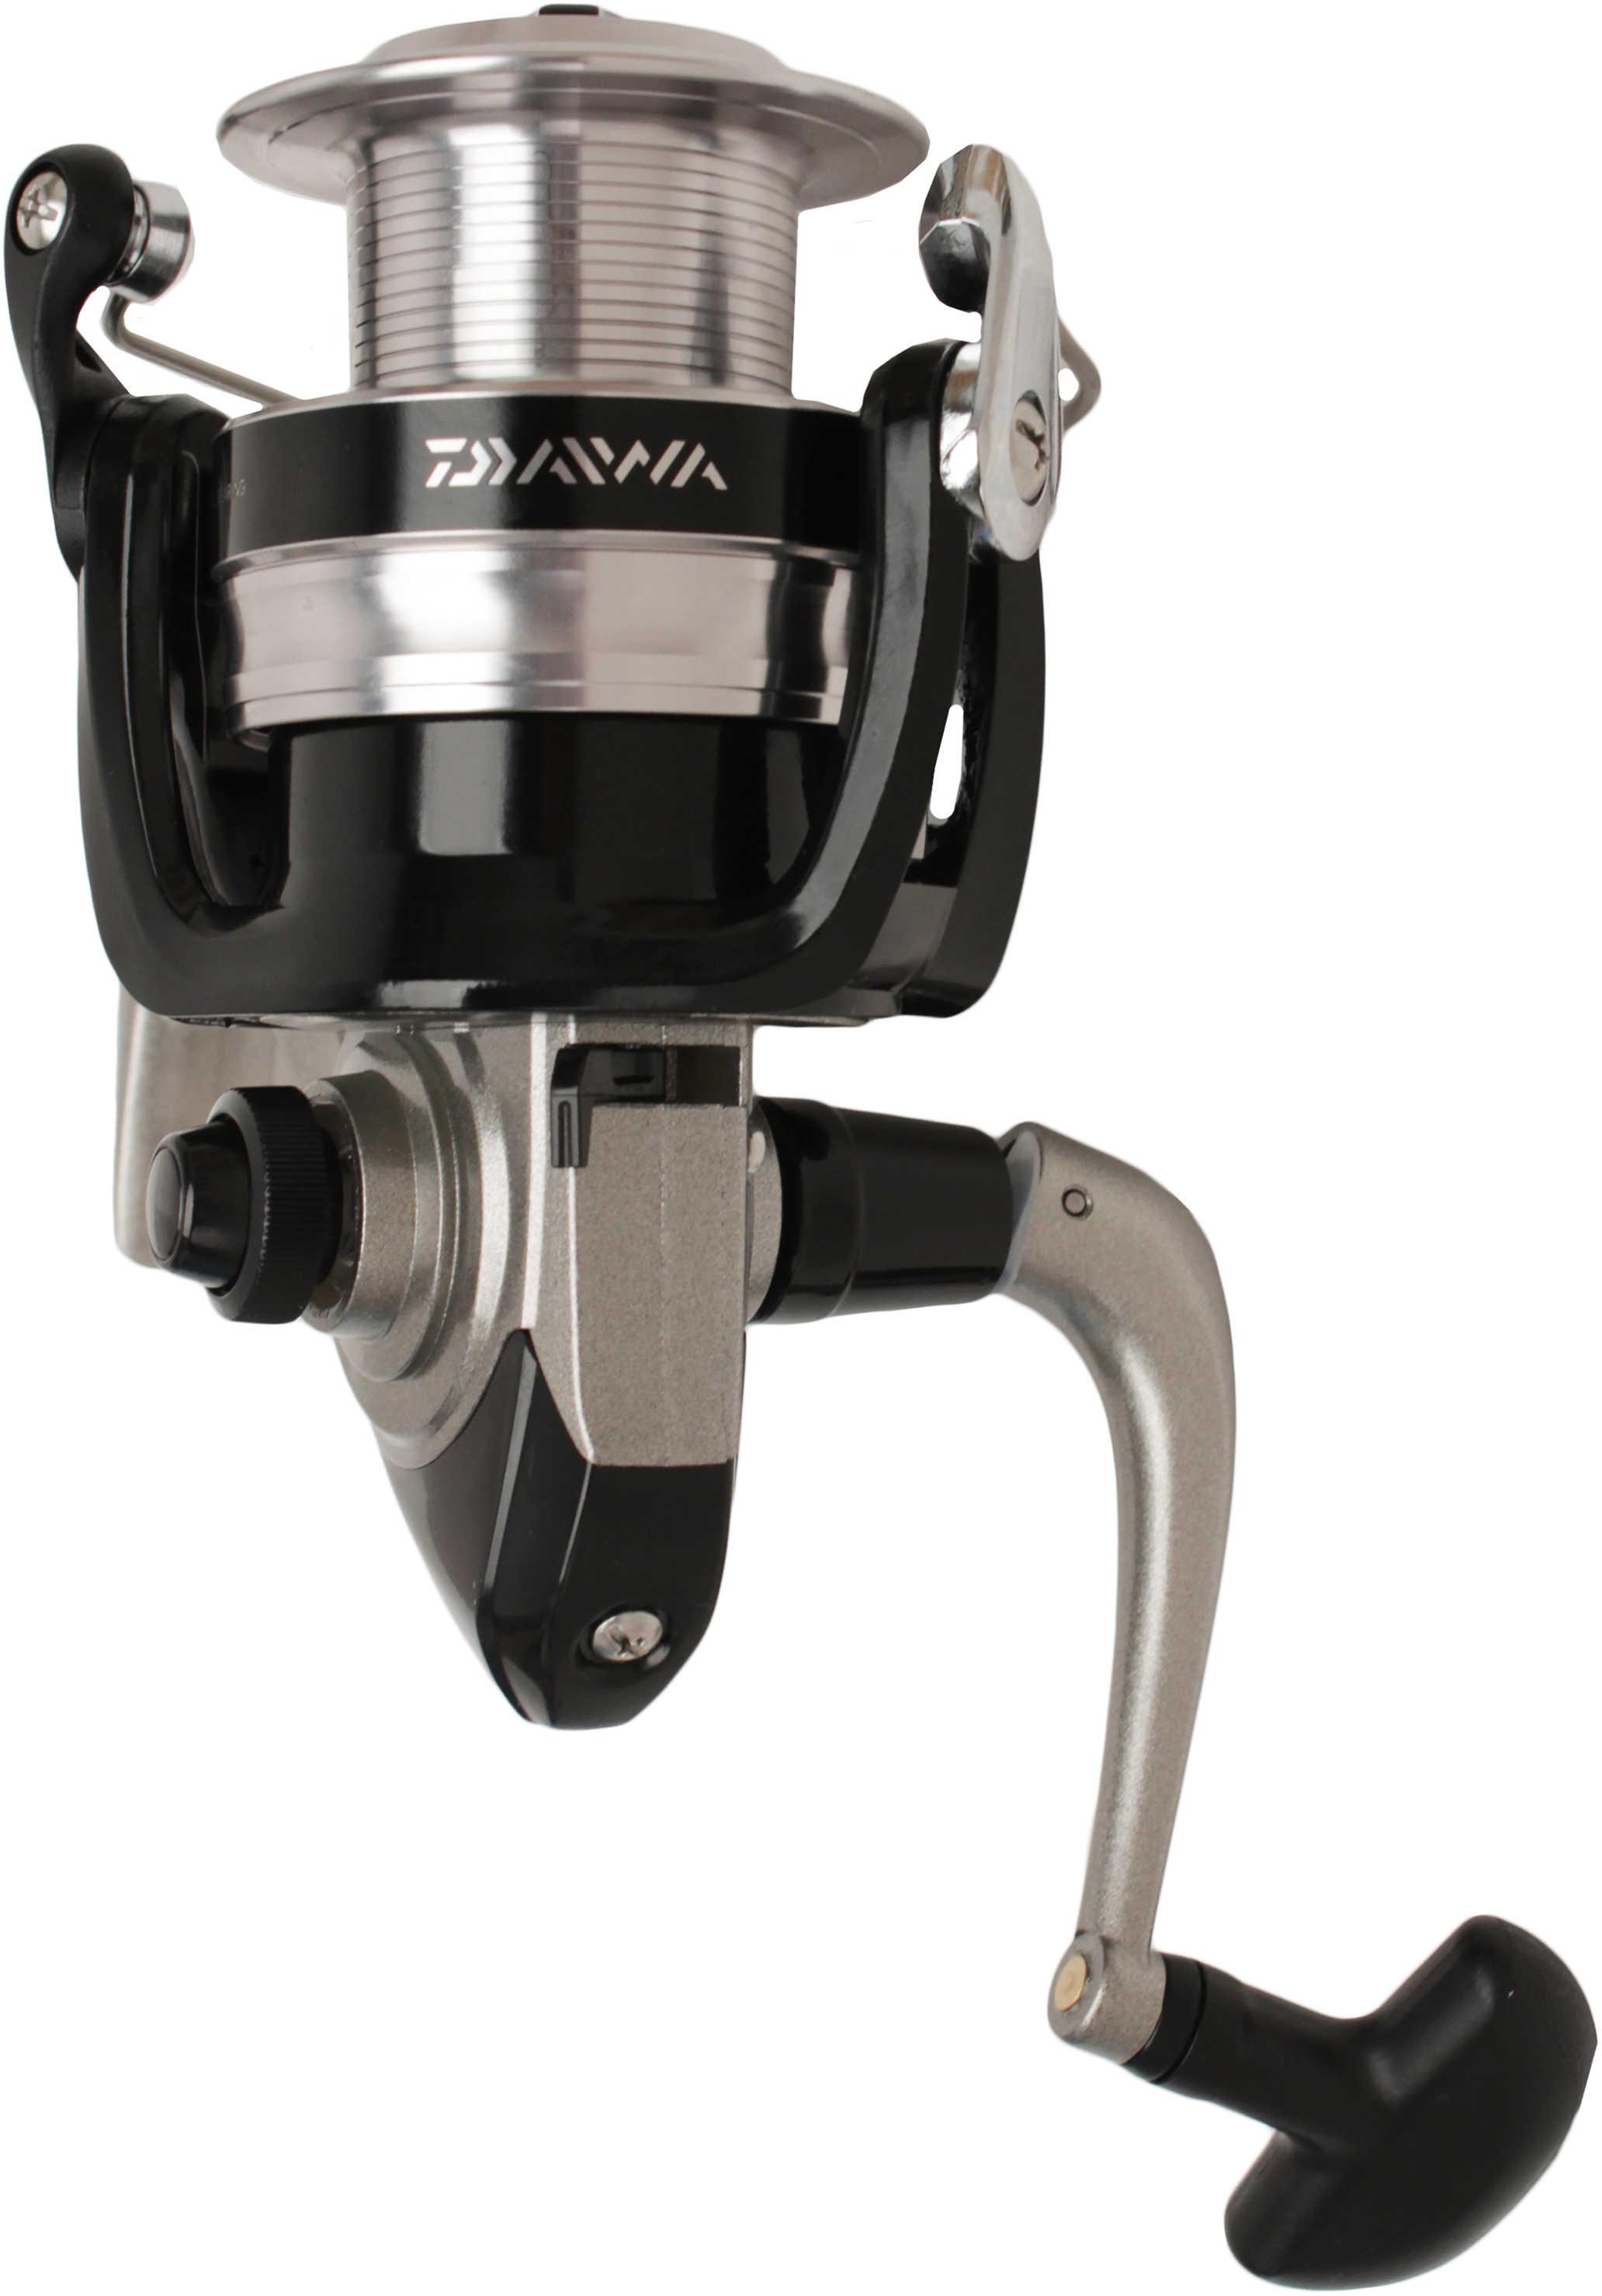 Daiwa Stikeforce-B Spinning Reel 4000 Md: SF4000-B